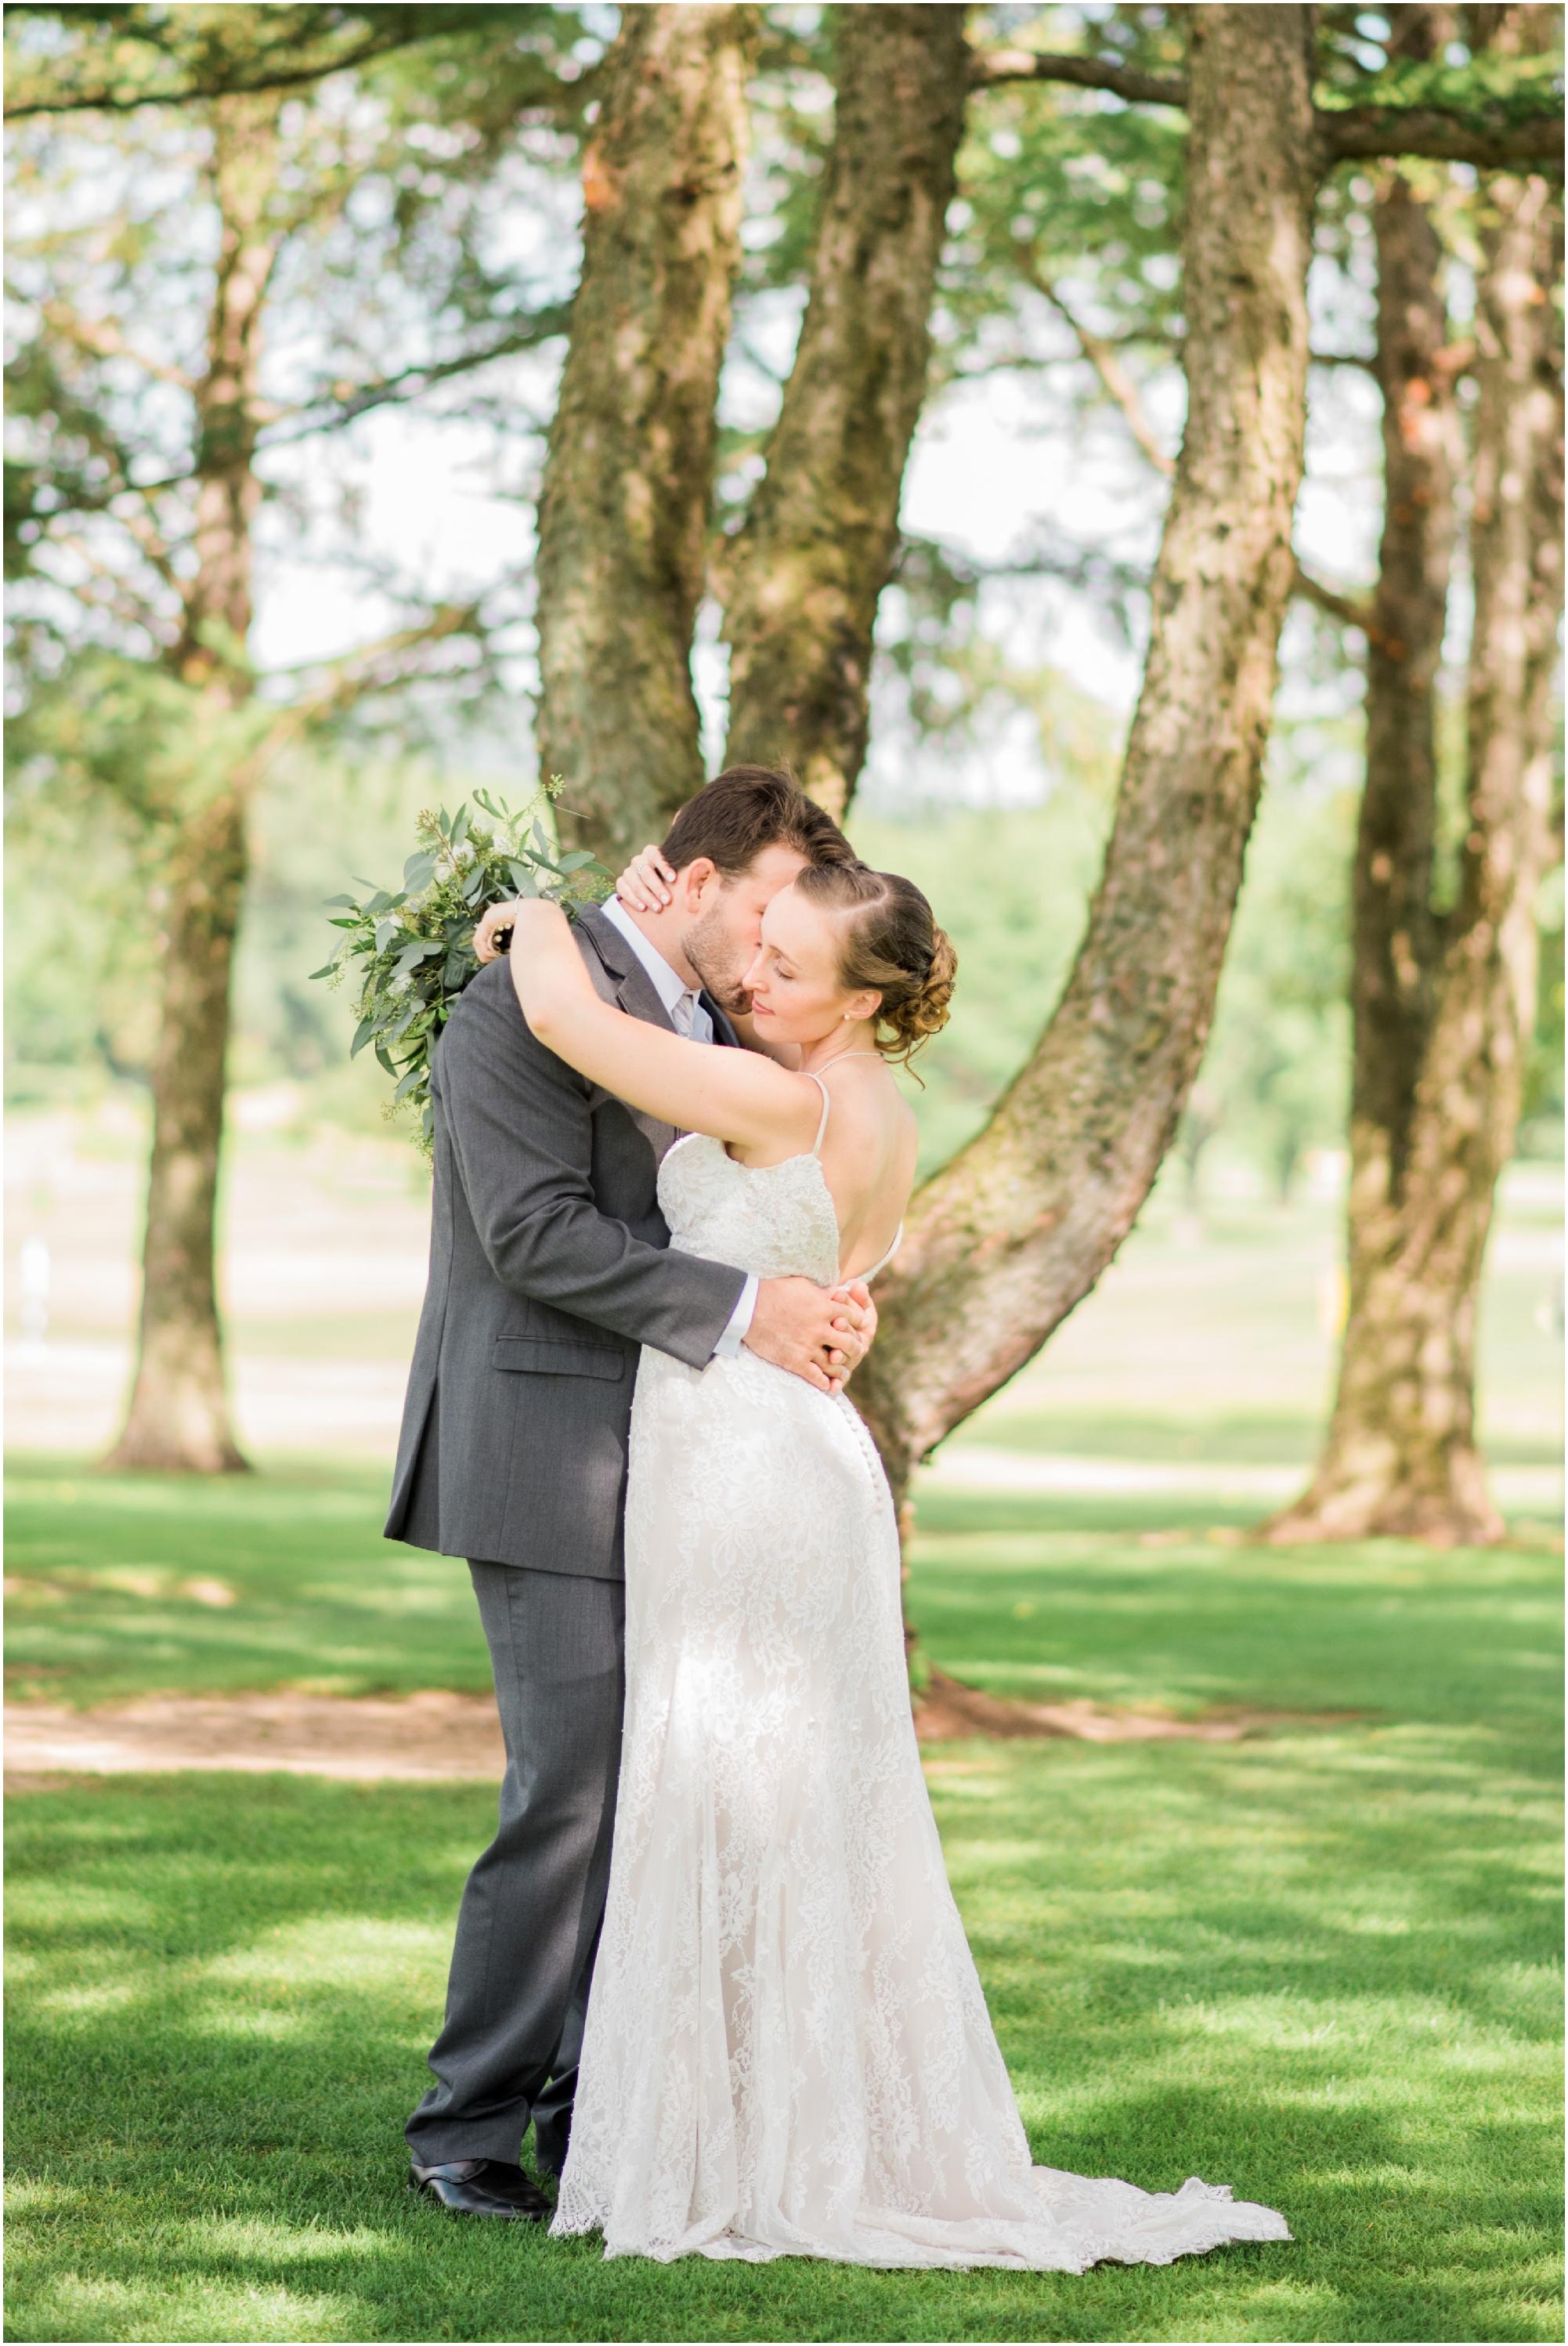 Wisconsin-Wedding-Photographer-Reedsburg-Country-Club-Kaela-and Matt-Wedding-277.jpg